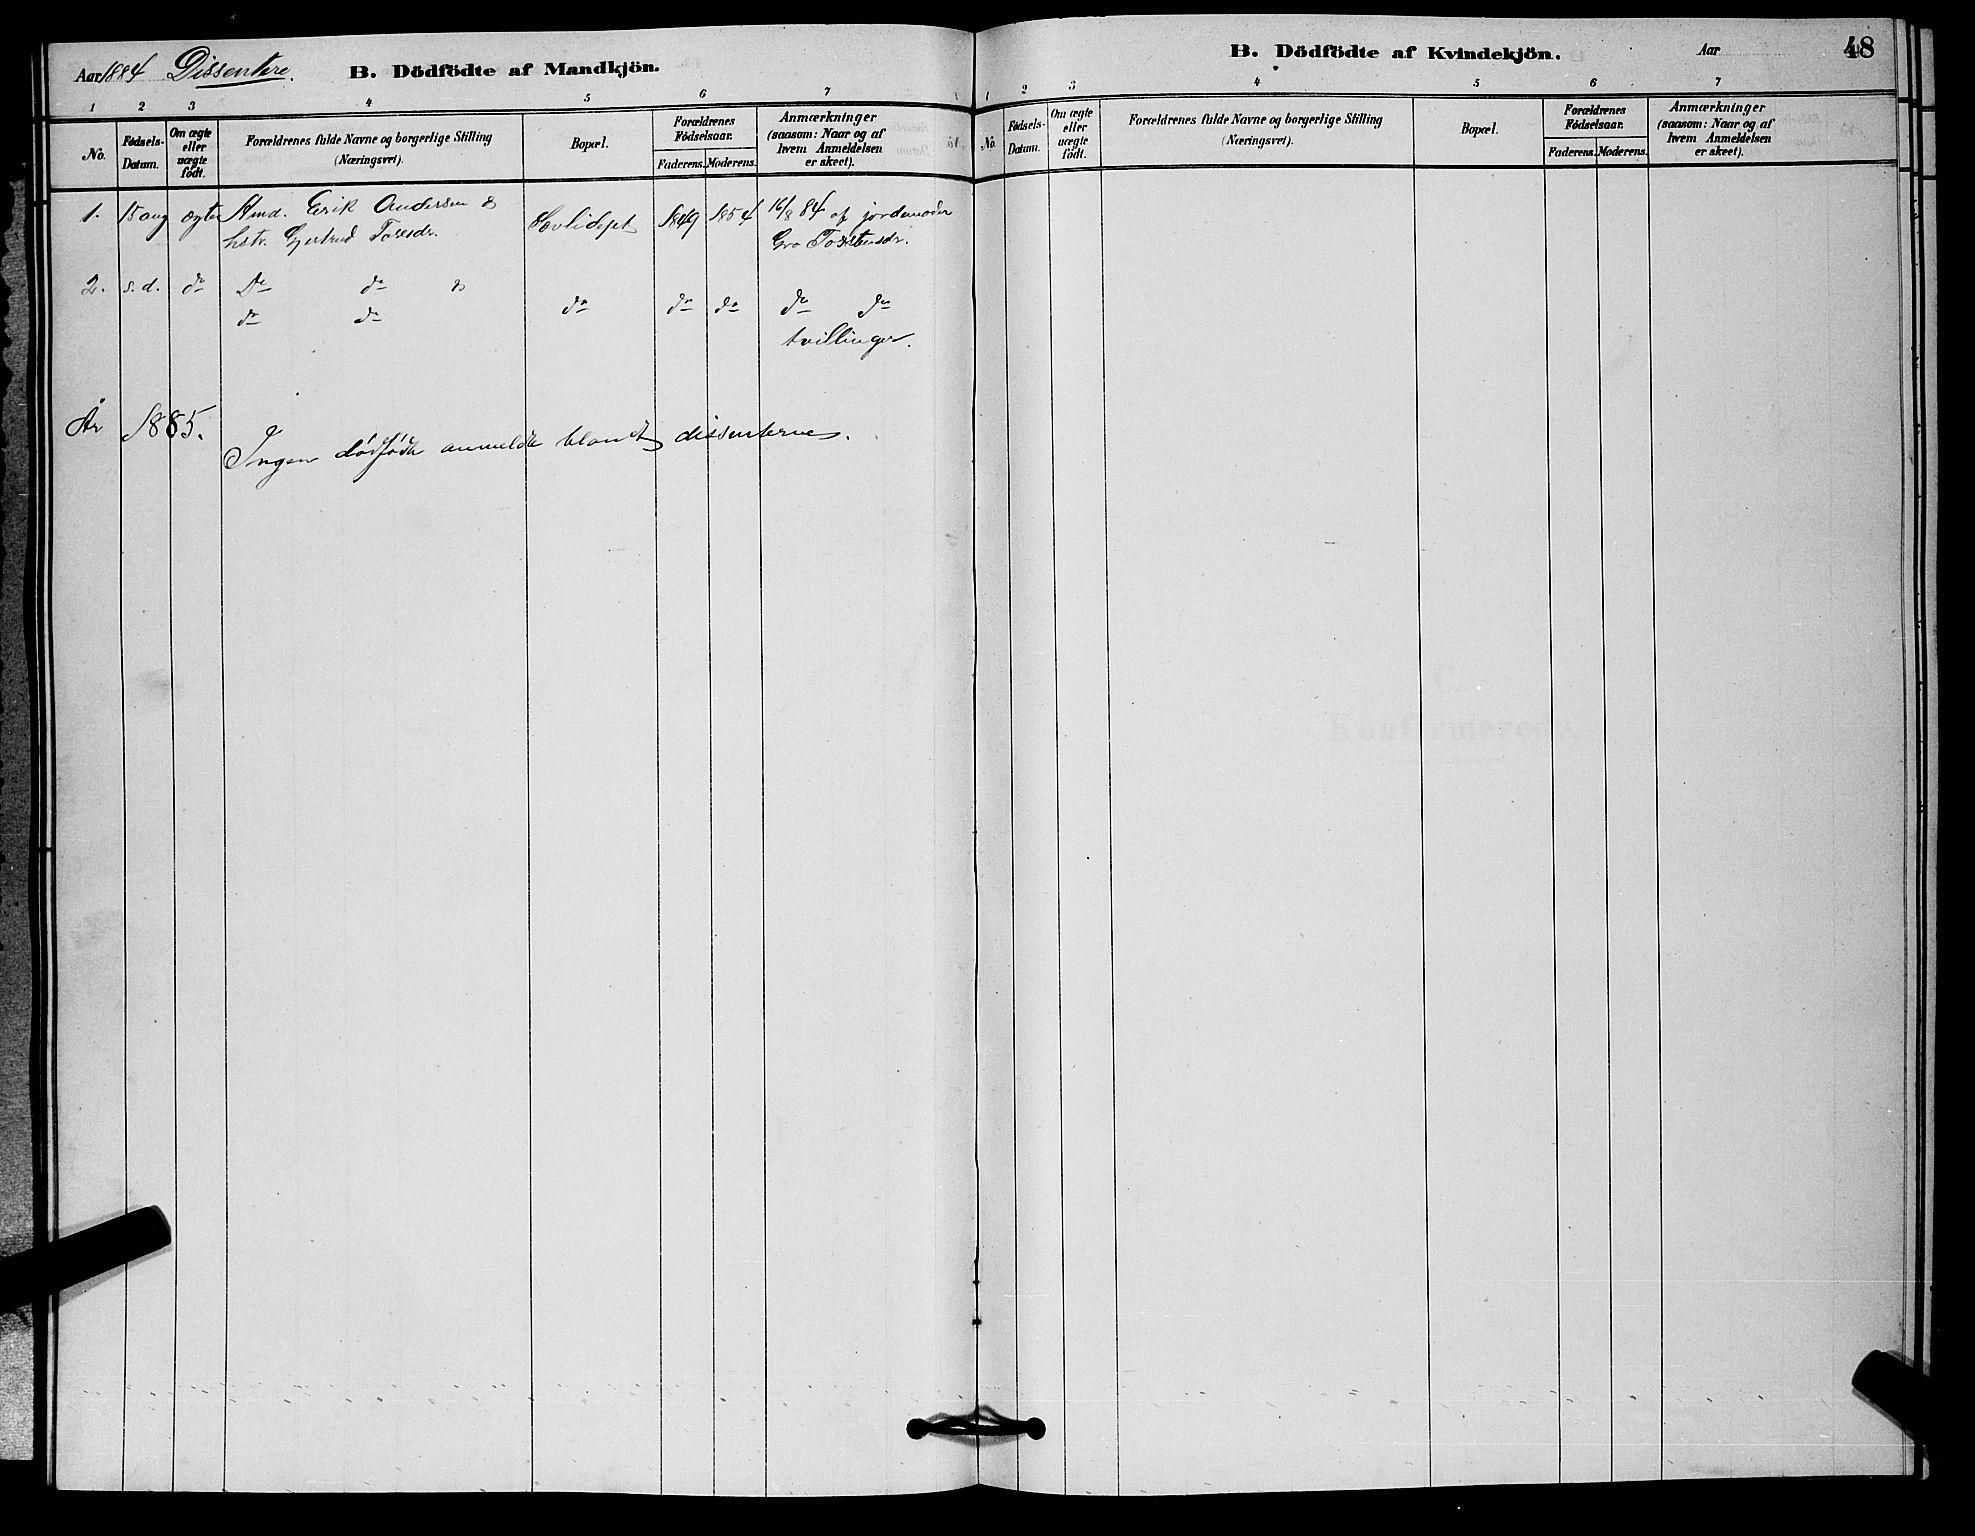 SAKO, Nore kirkebøker, G/Ga/L0002: Klokkerbok nr. I 2, 1878-1885, s. 48